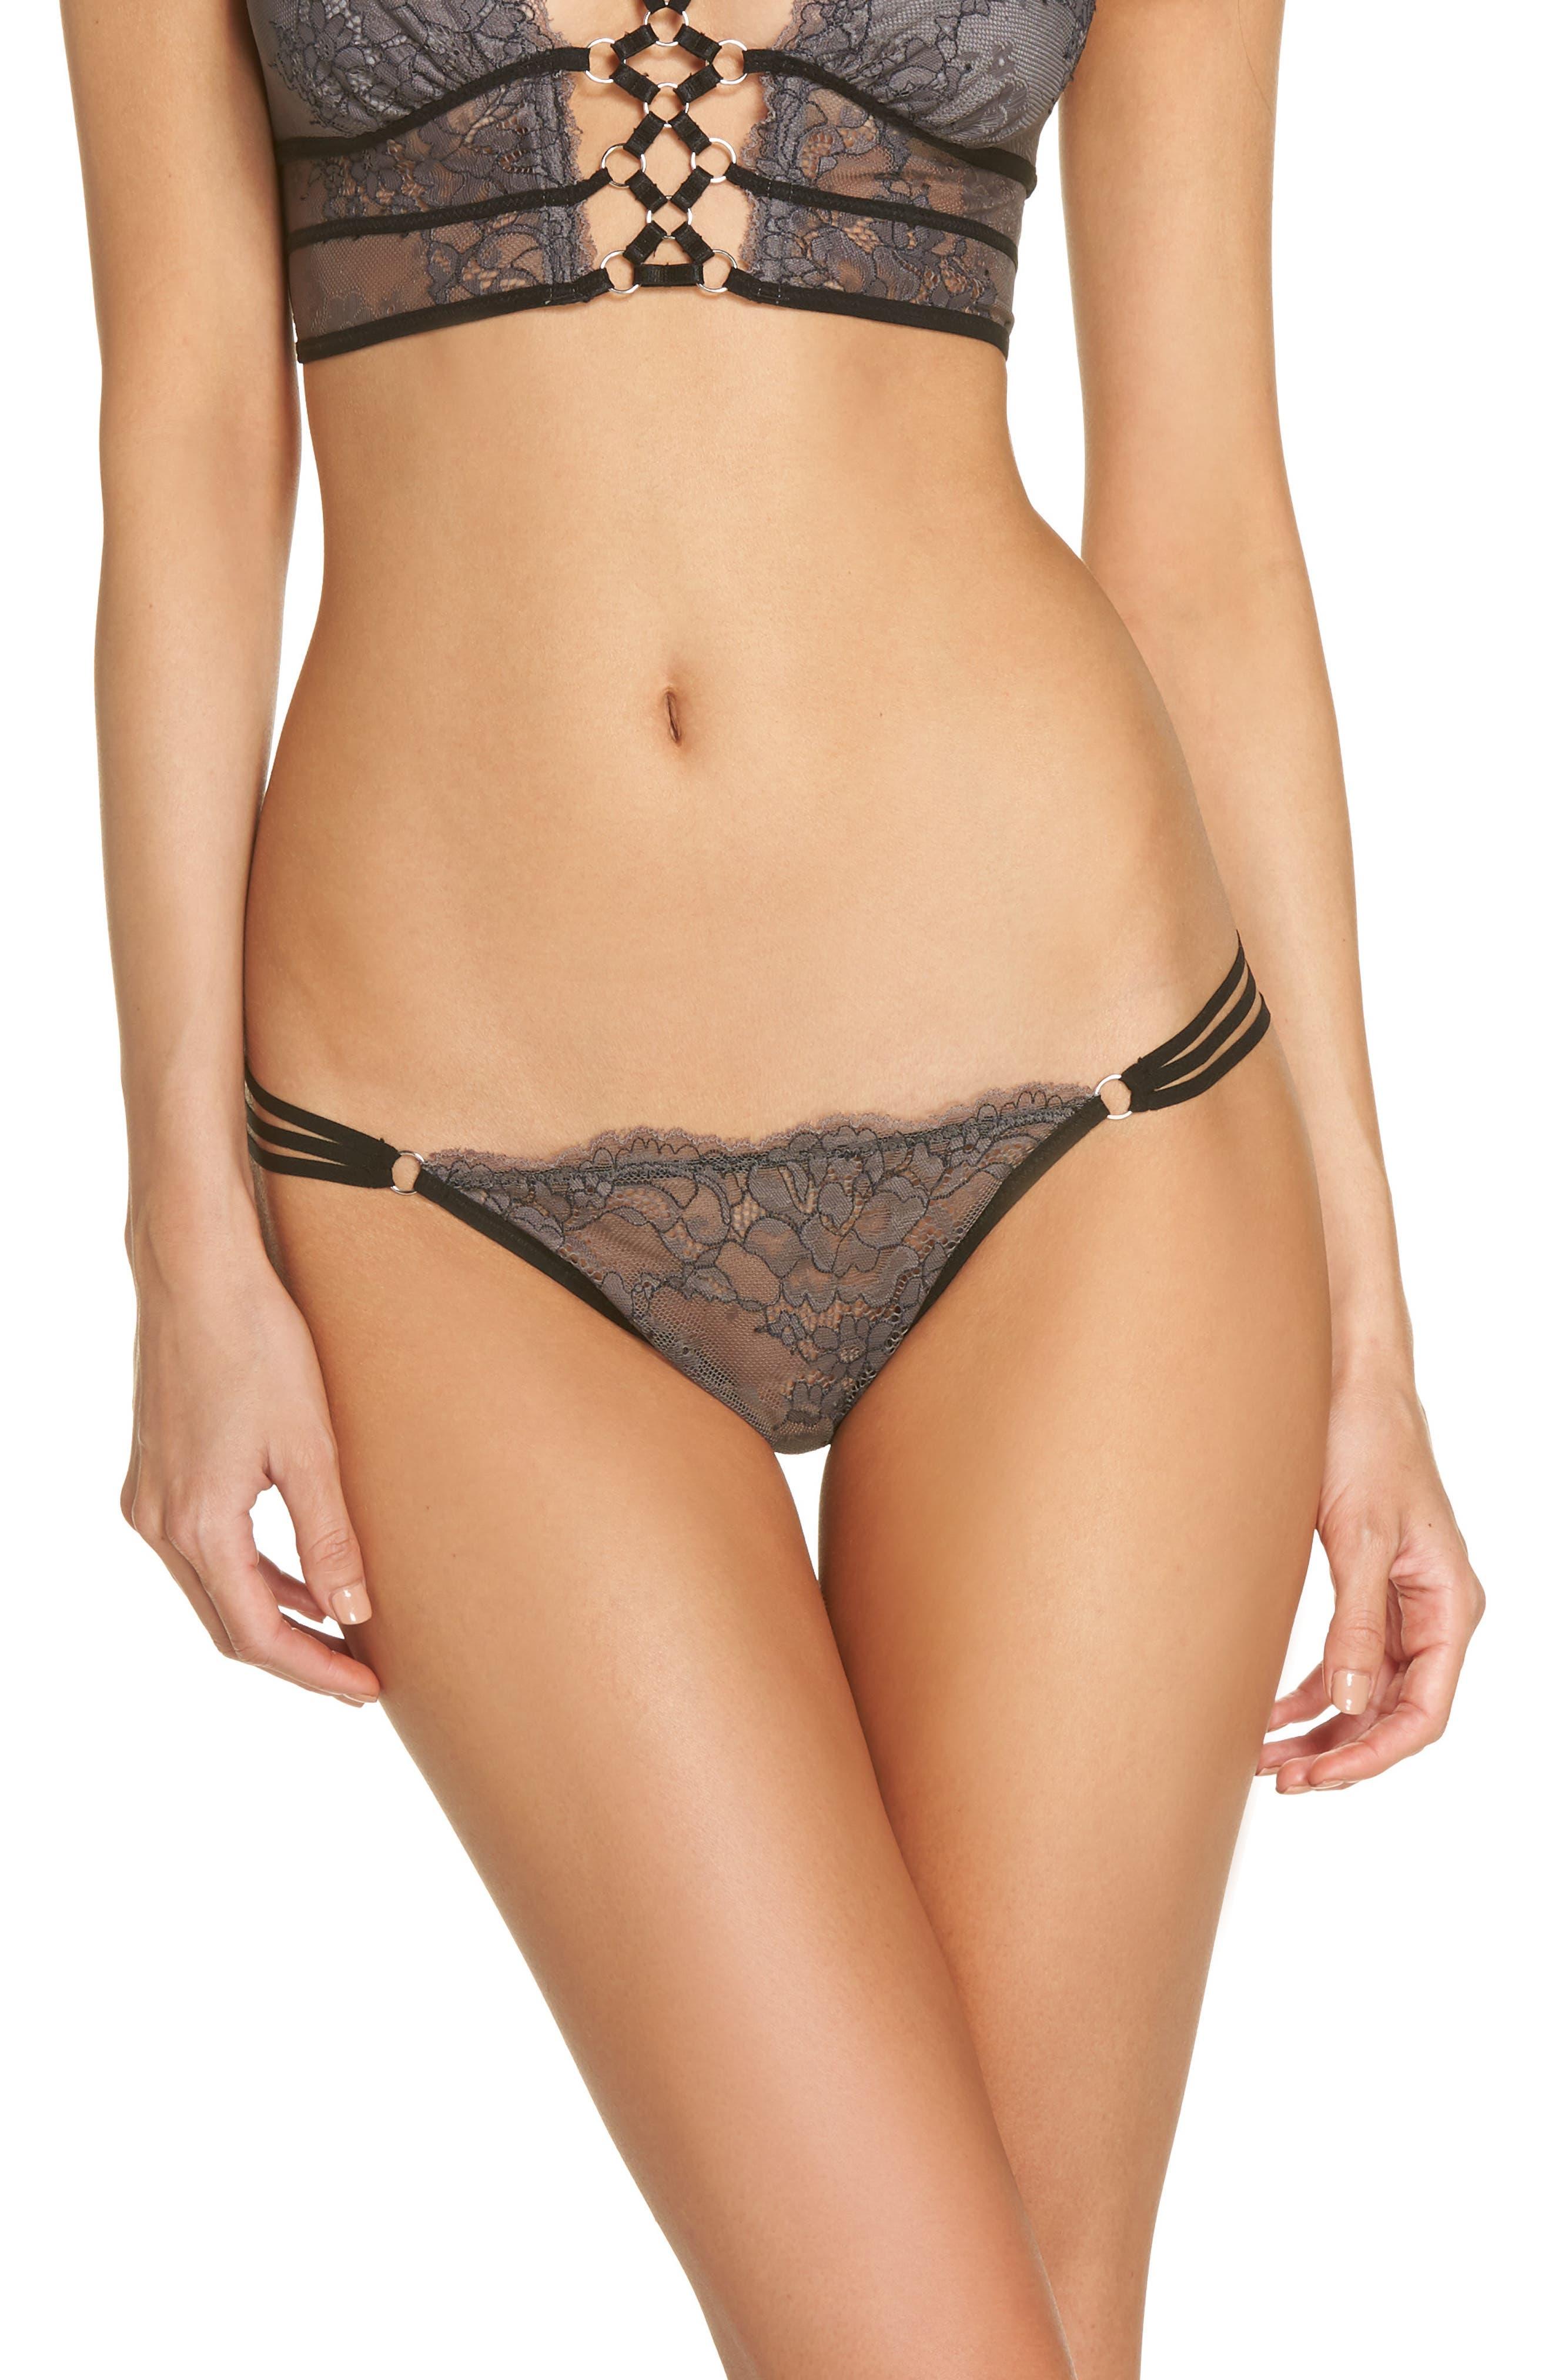 Thistle & Spire Constellation Lace Bikini,                             Main thumbnail 1, color,                             Steel